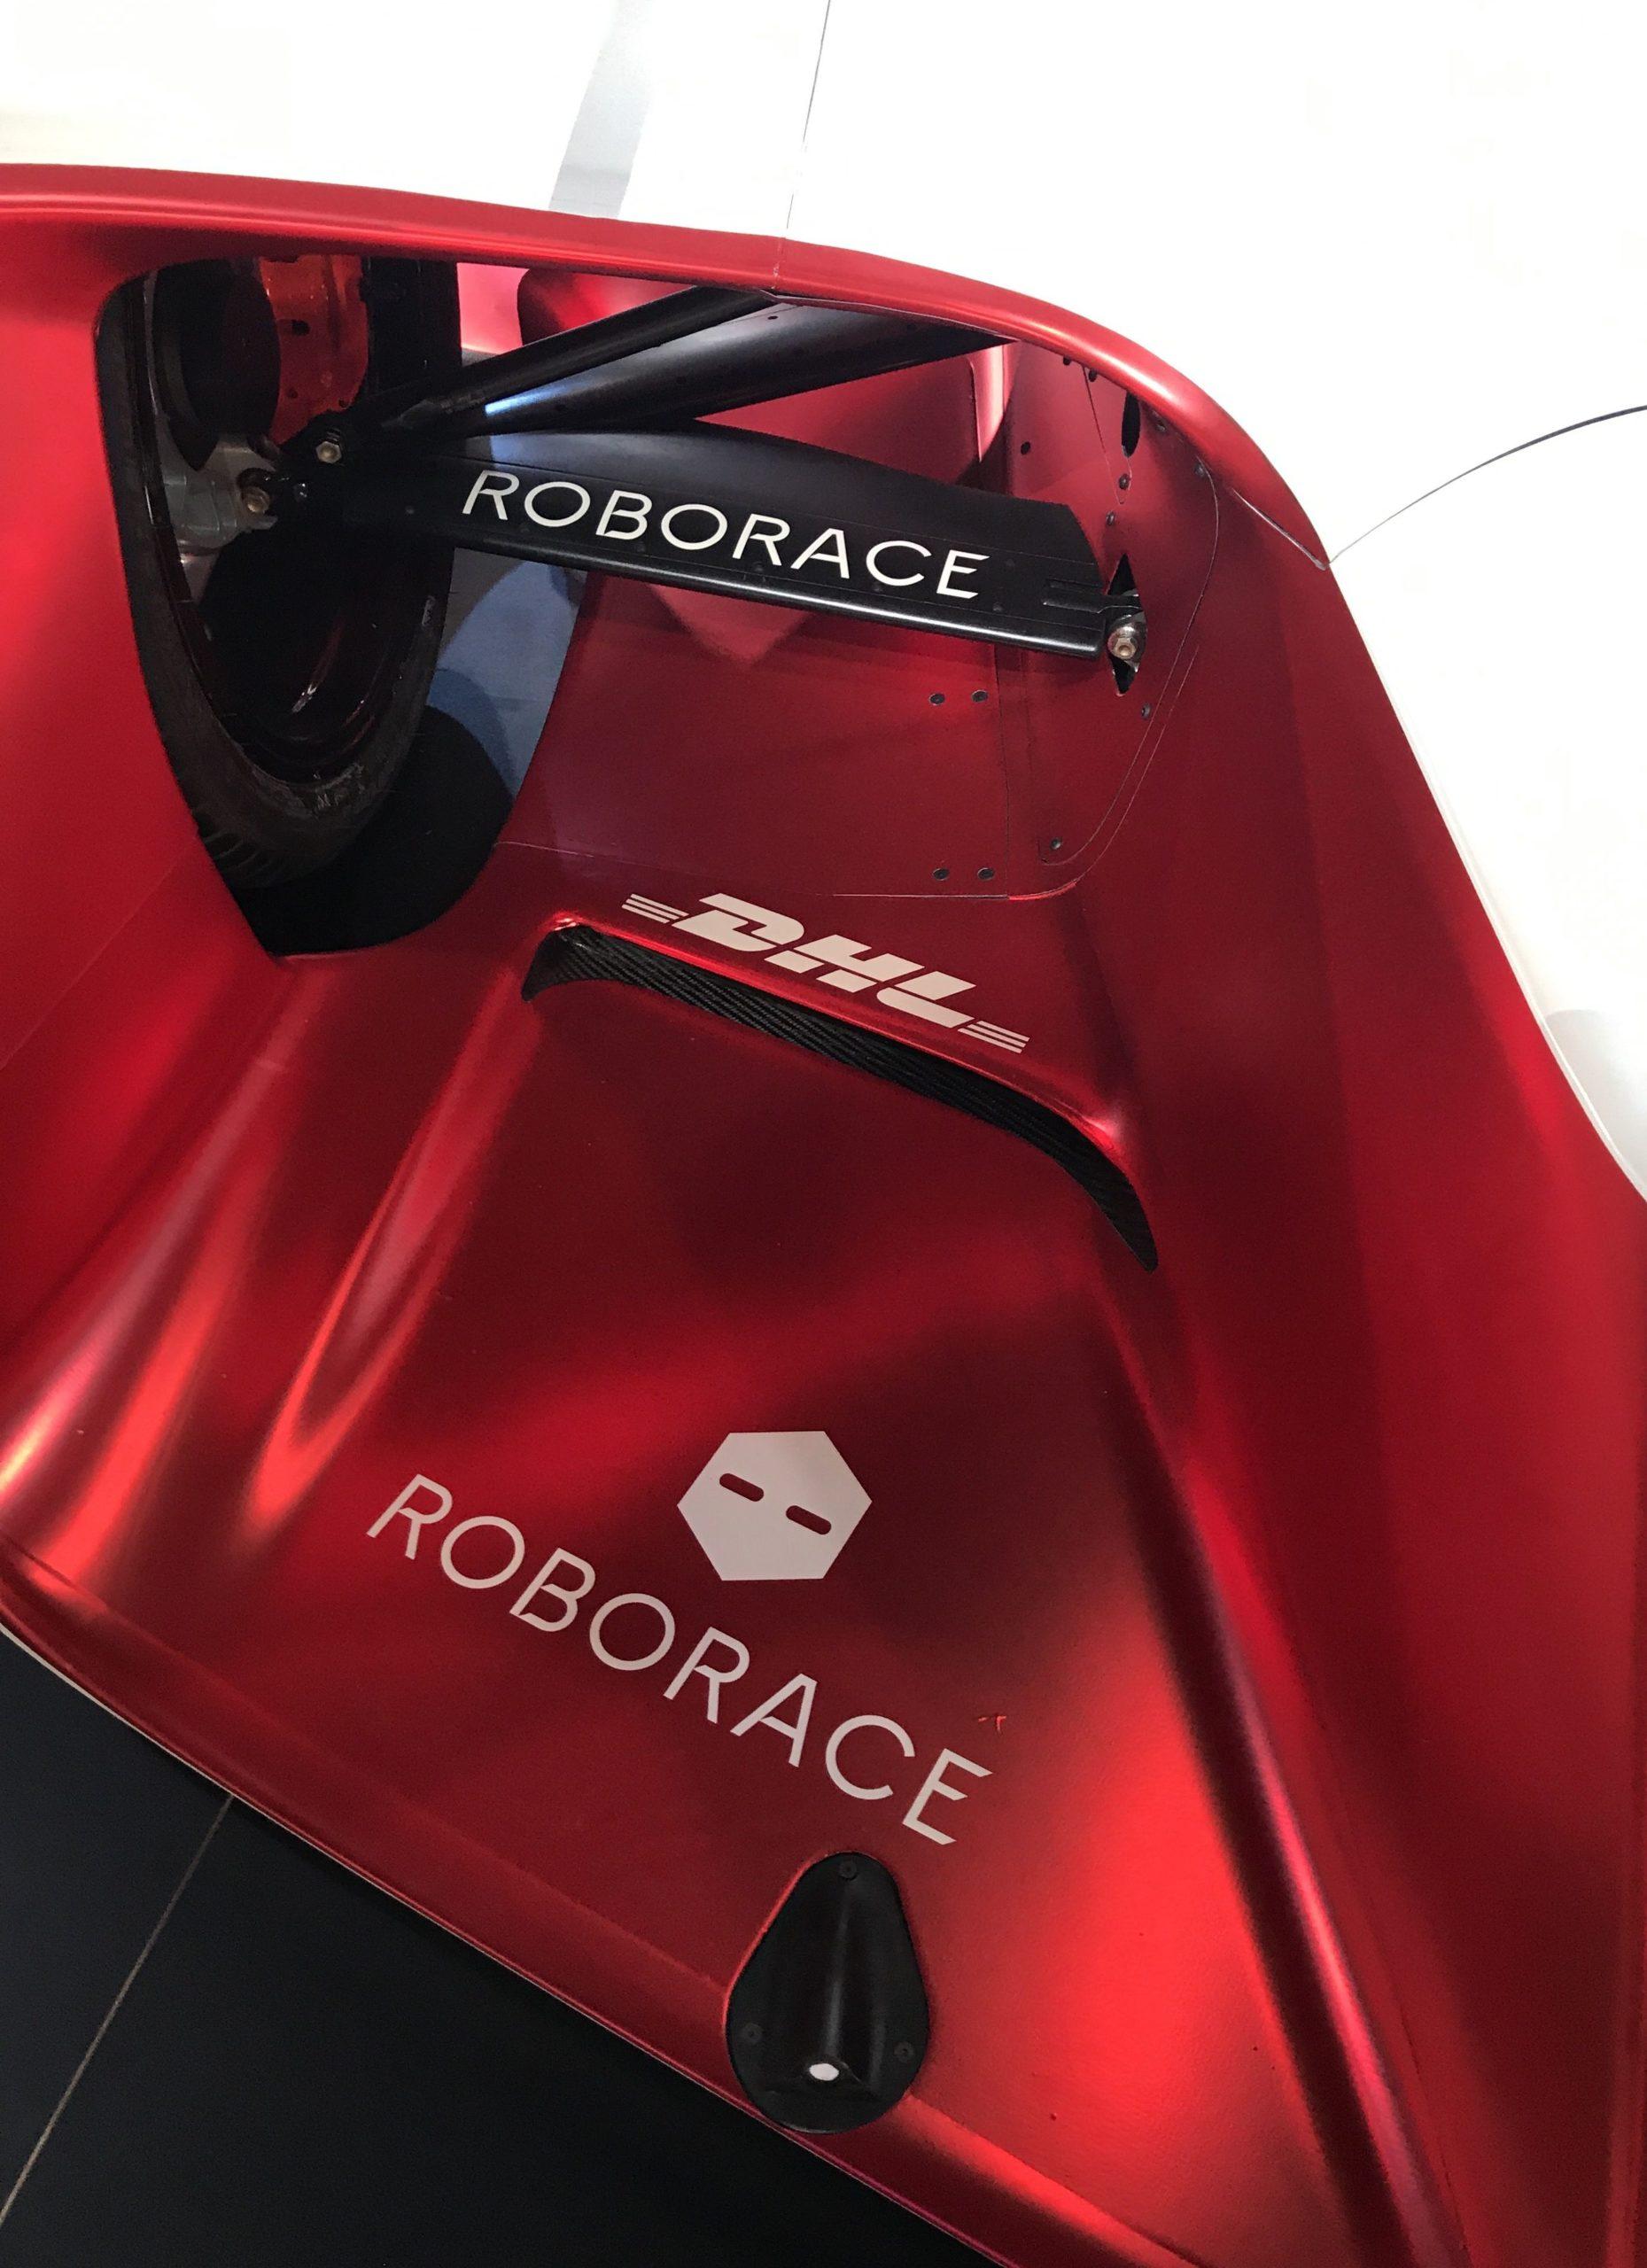 RoboRace driverless racing car (photo – Andy Pidgeon)